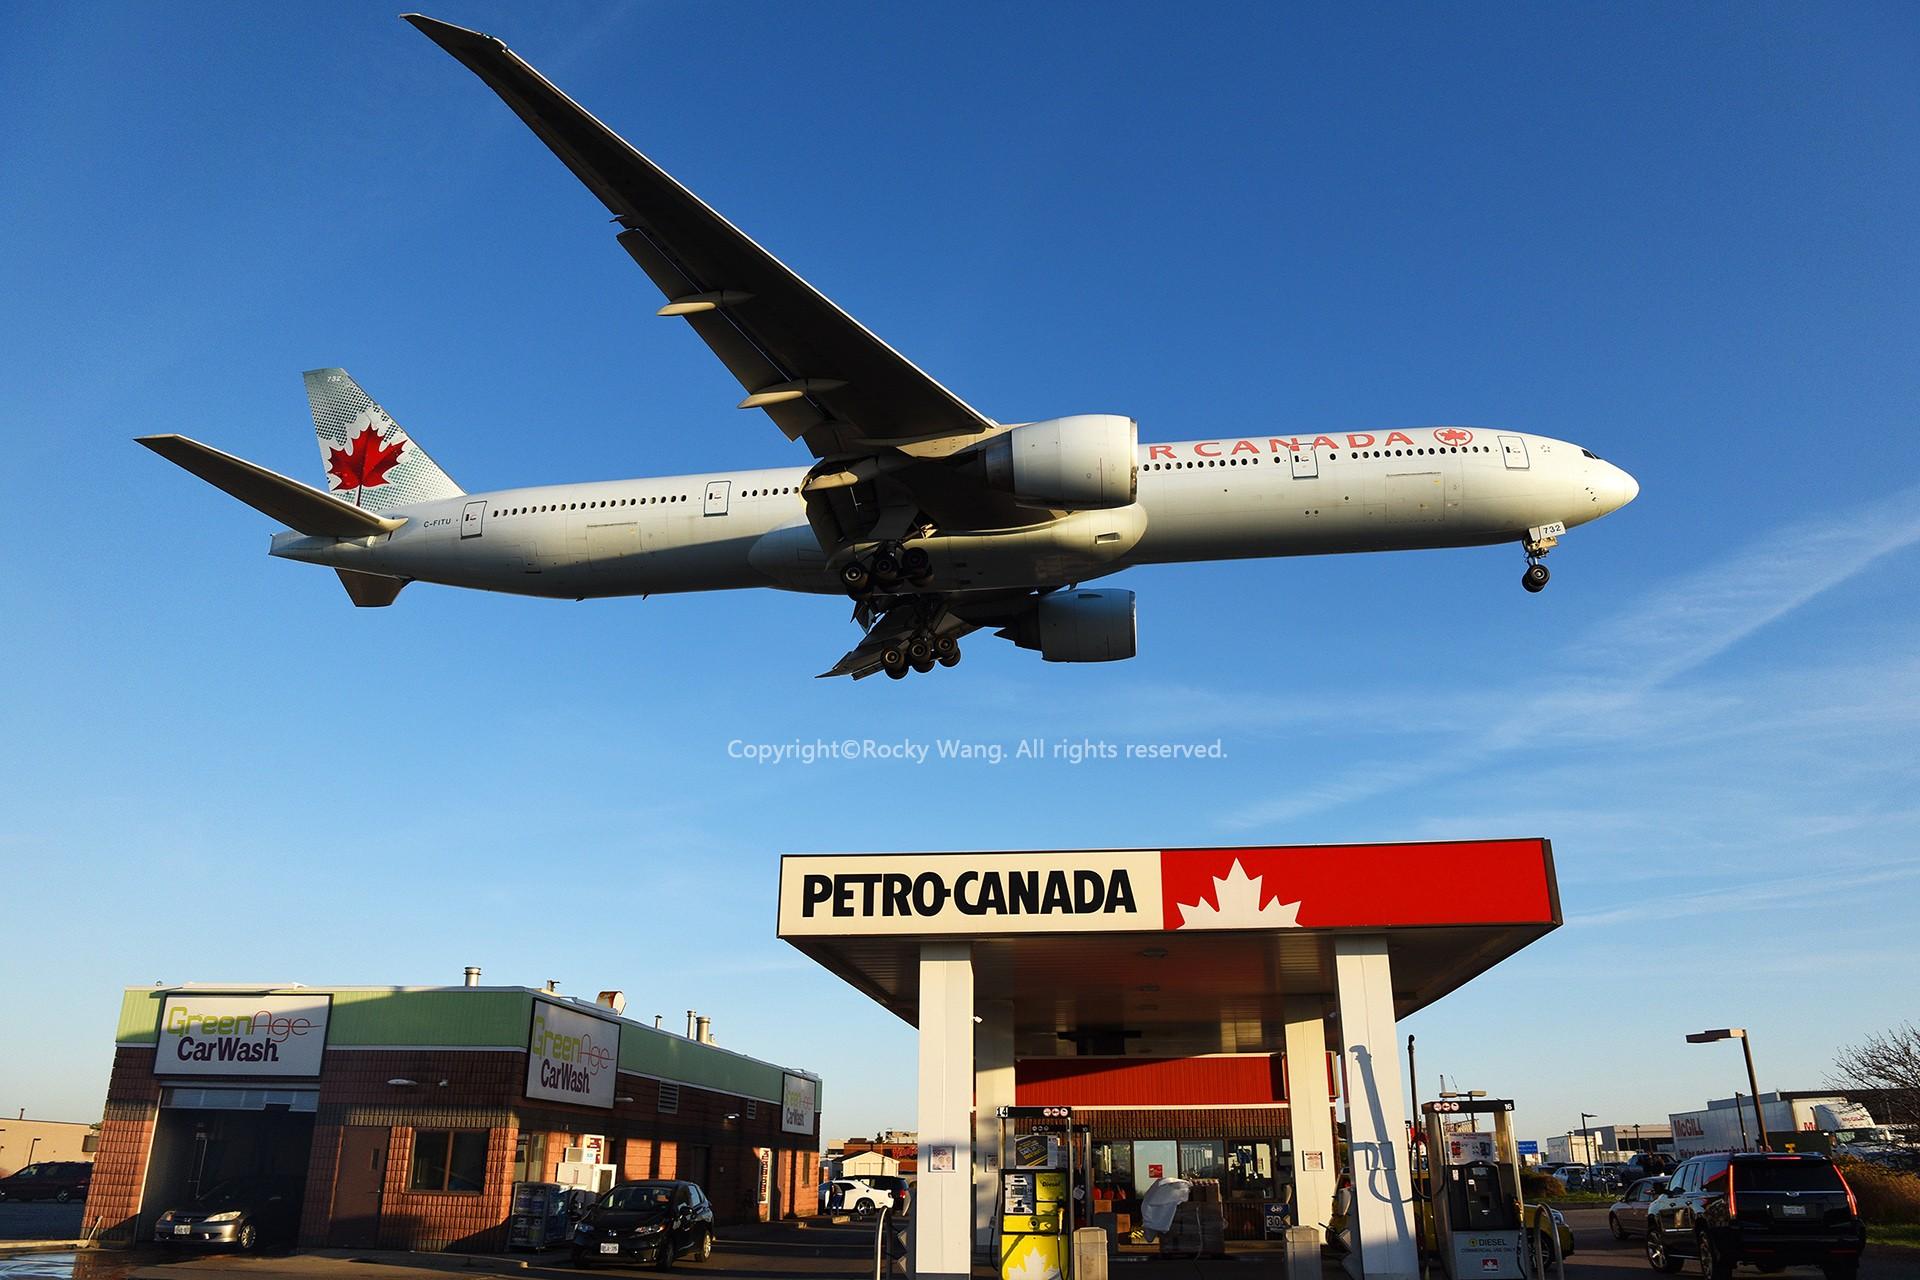 Re:[原创]CYYZ 30图 BOEING 777-333ER C-FITU Toronto Lester B. Pearson Int'l Airport